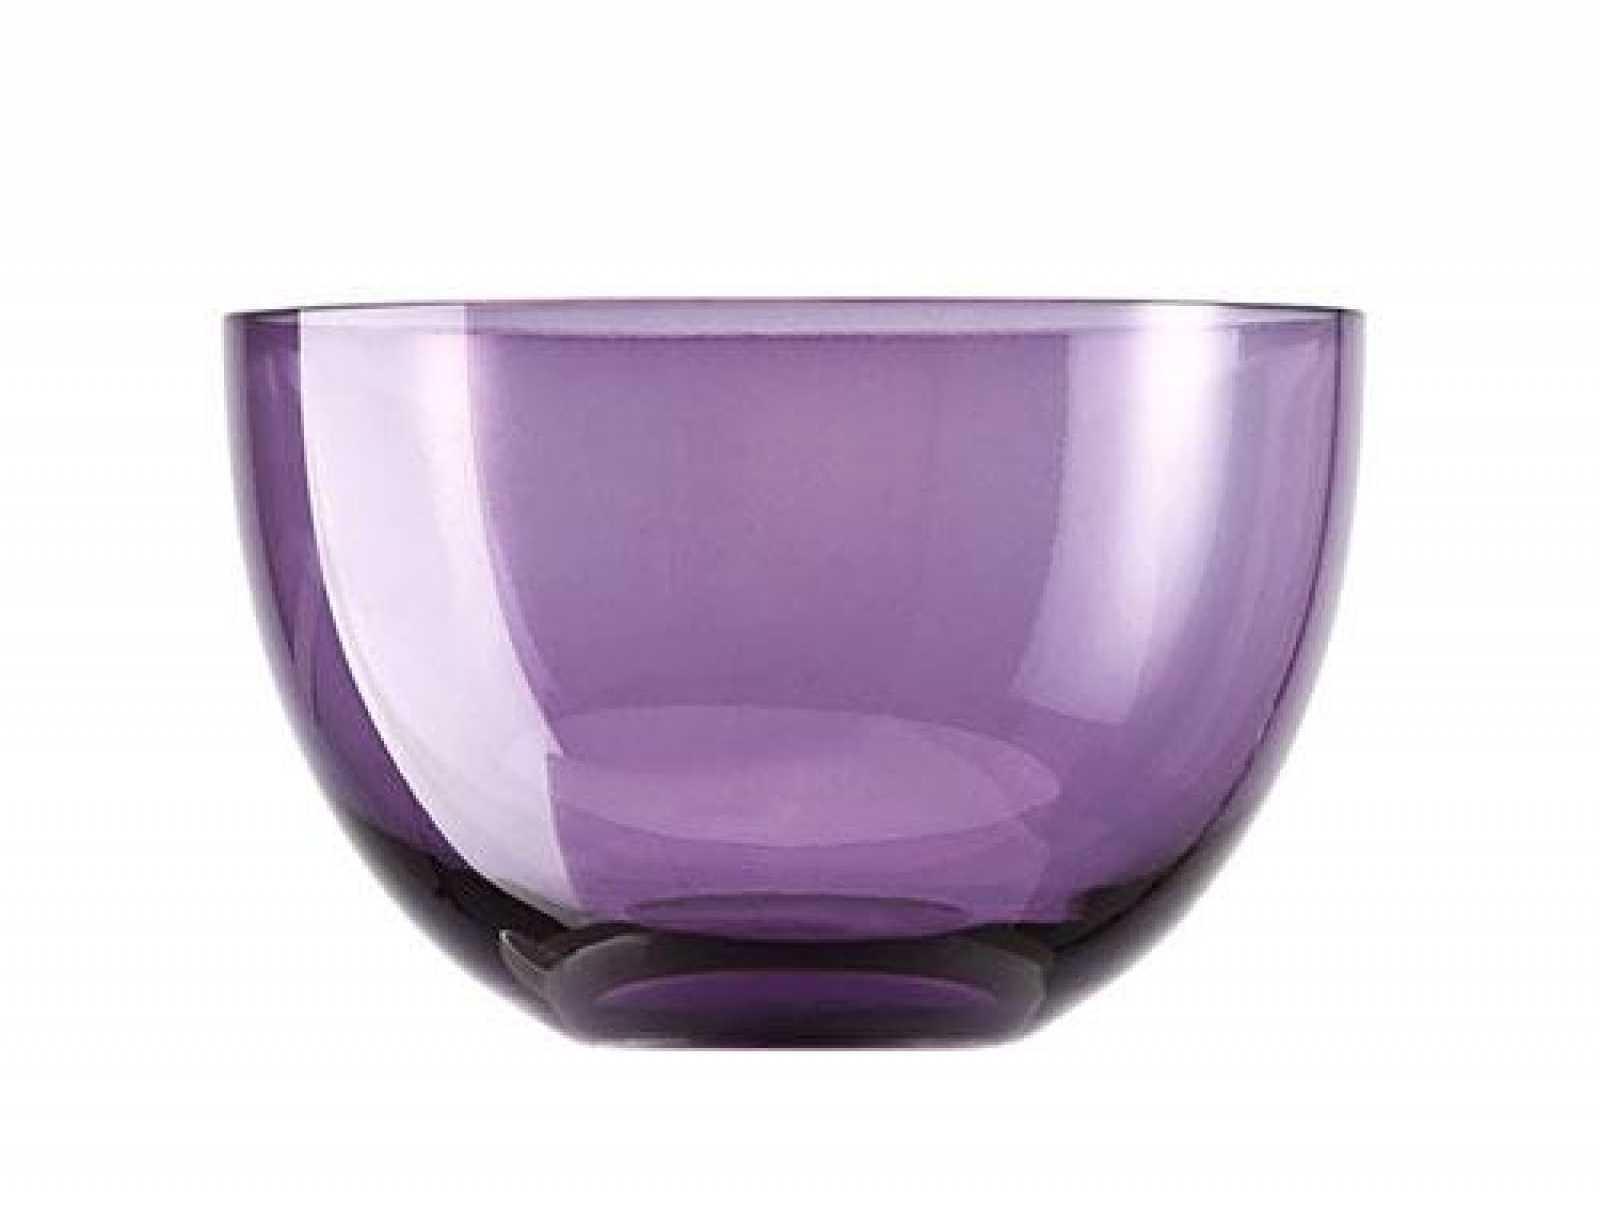 Пиала стеклянная Rosenthal SUNNY DAY, диаметр 12 см, фиолетовый Rosenthal 69034-408531-45312 фото 2